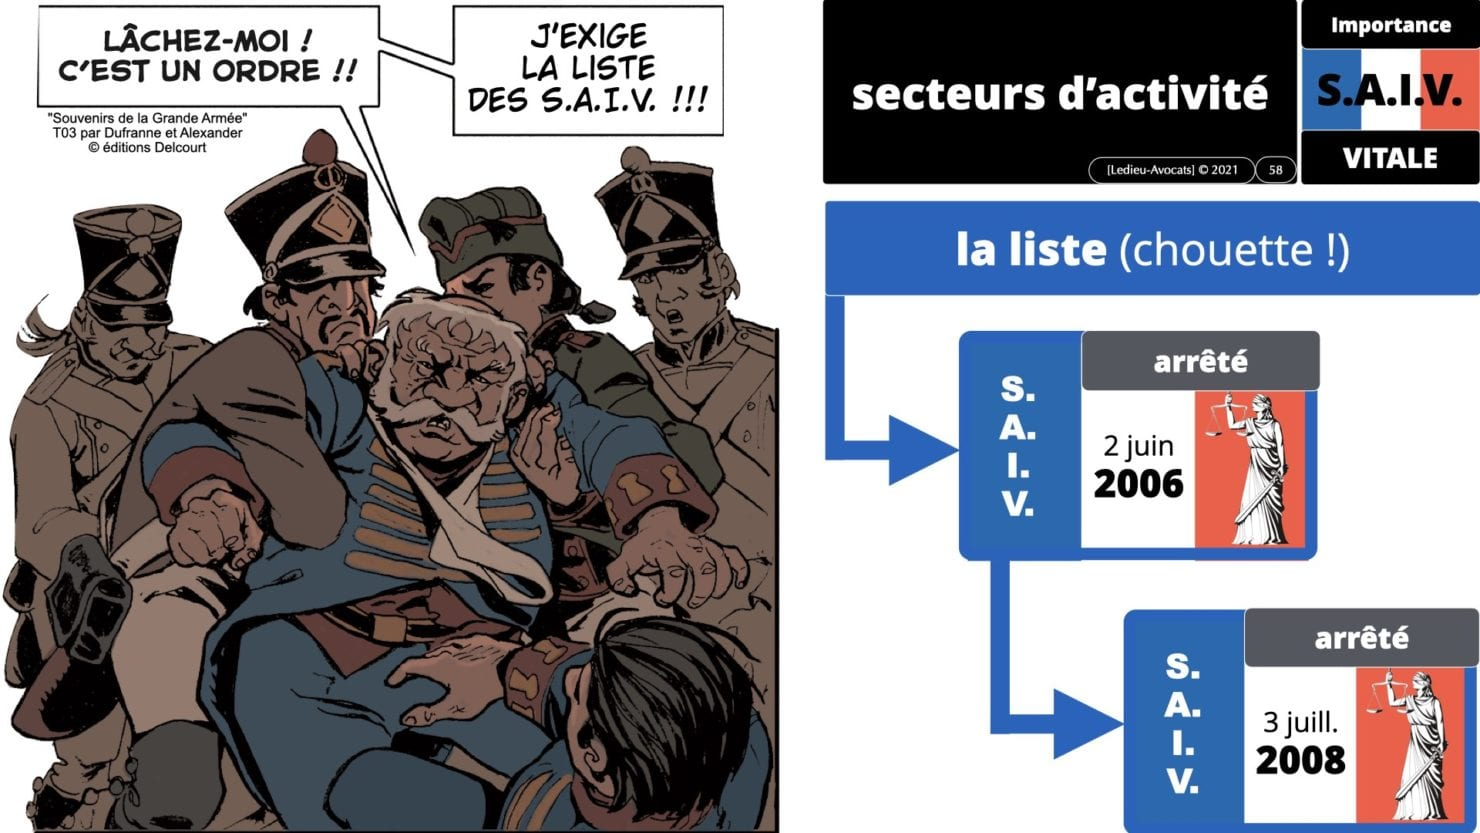 337 cyber sécurité #1 OIV OSE Critical Entities © Ledieu-avocat 15-06-2021.058